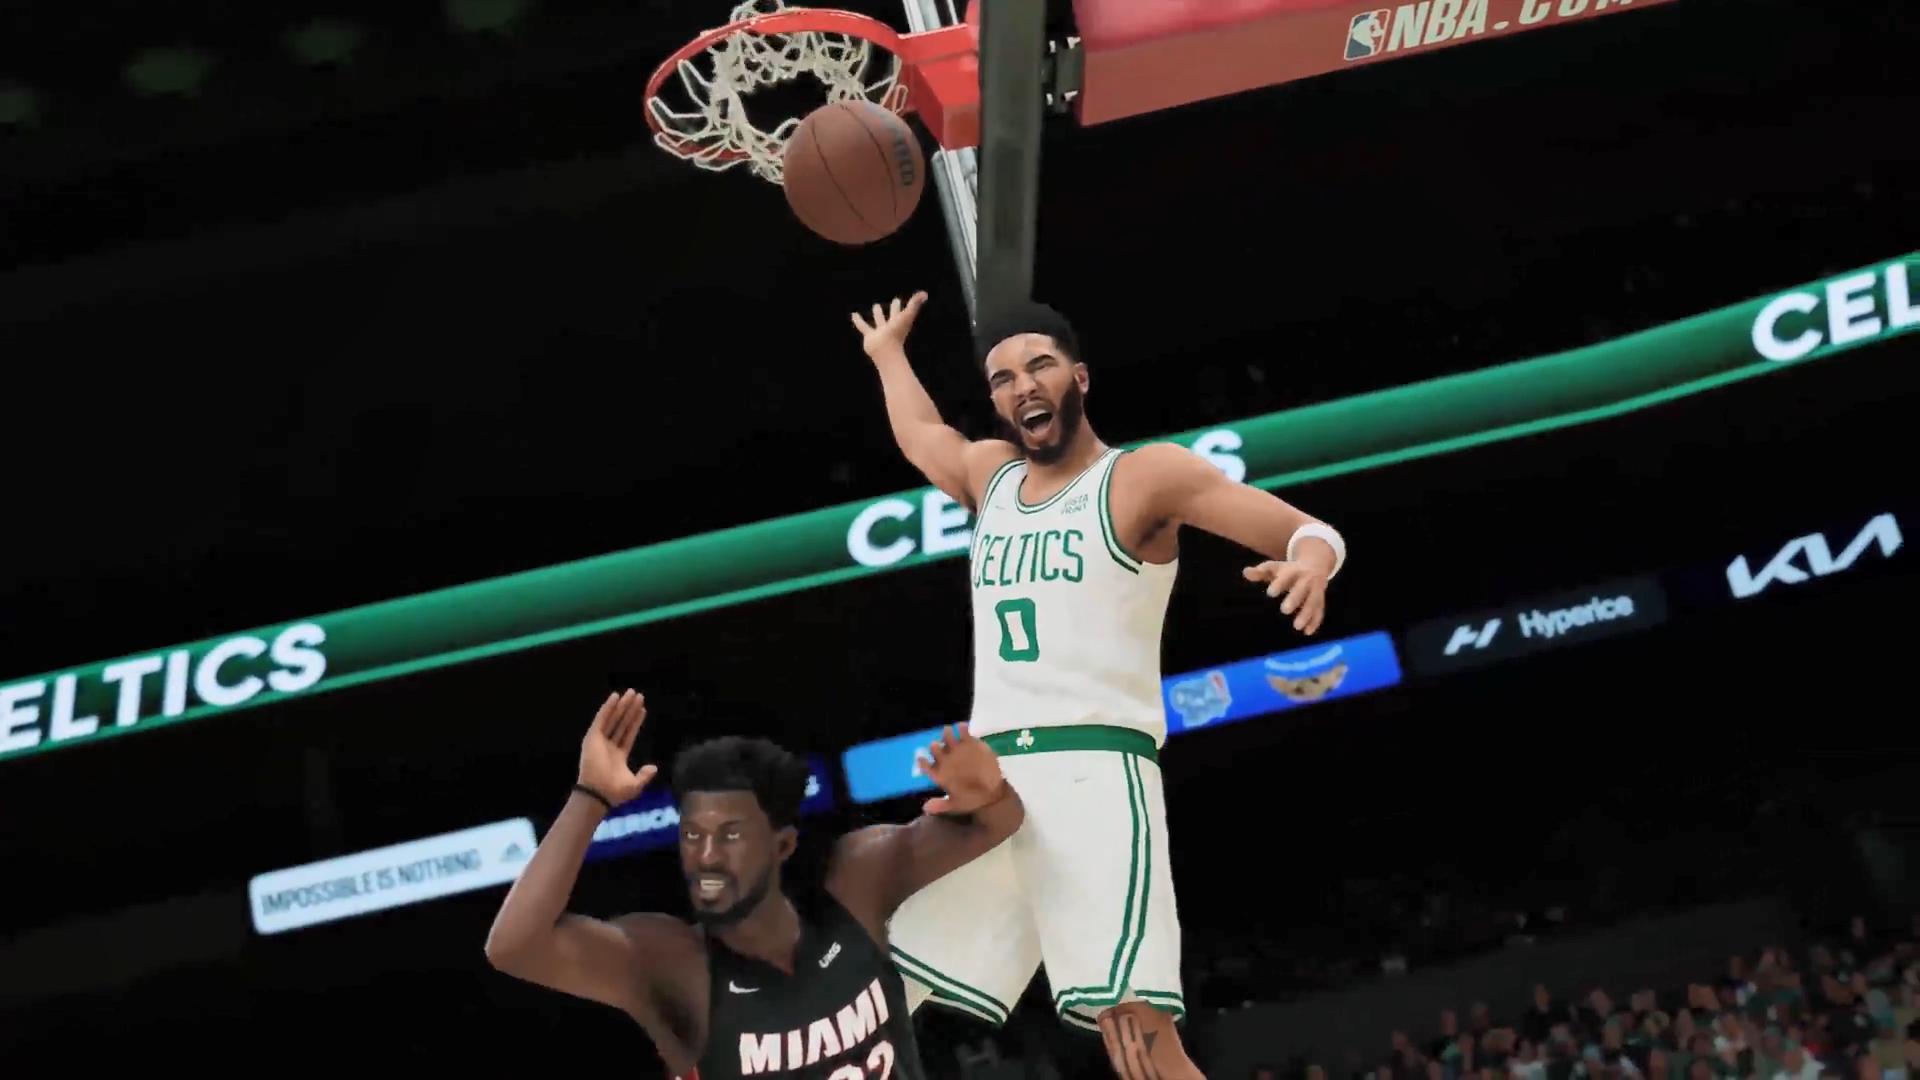 《NBA 2K22》实机演示预告片 9月10号正式发售